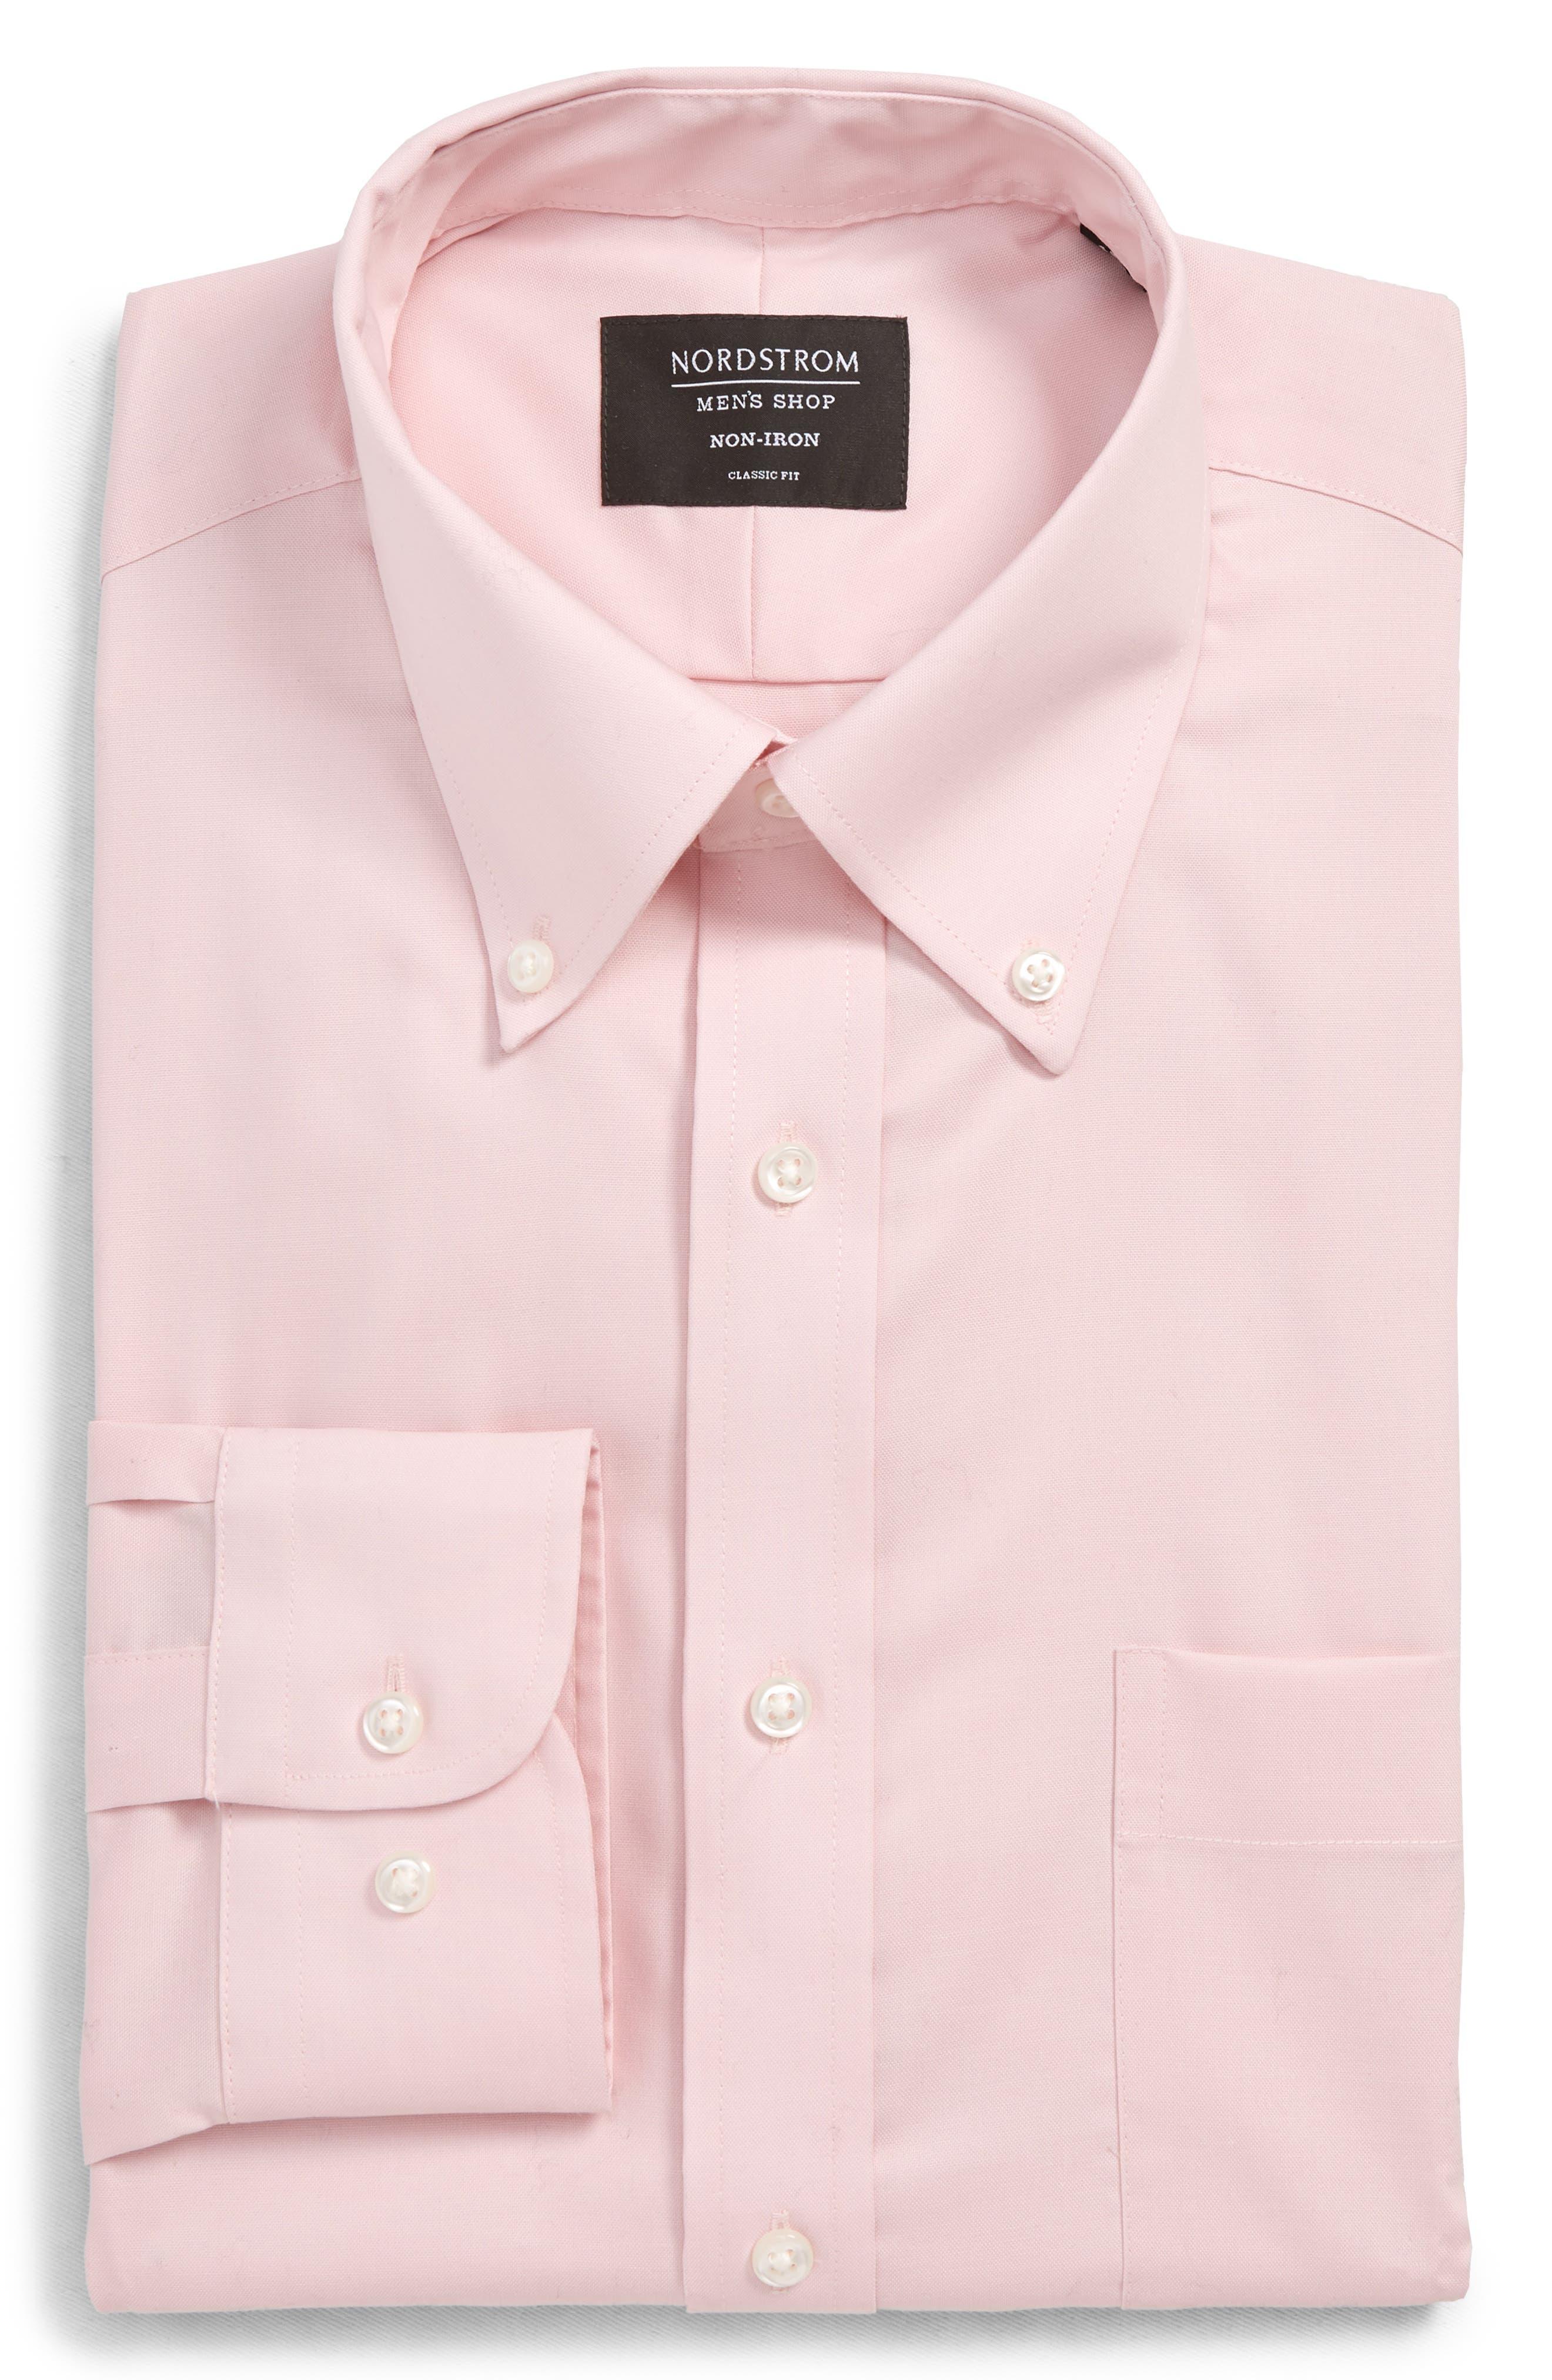 NORDSTROM MEN'S SHOP Classic Fit Non-Iron Dress Shirt, Main, color, PINK BREATH